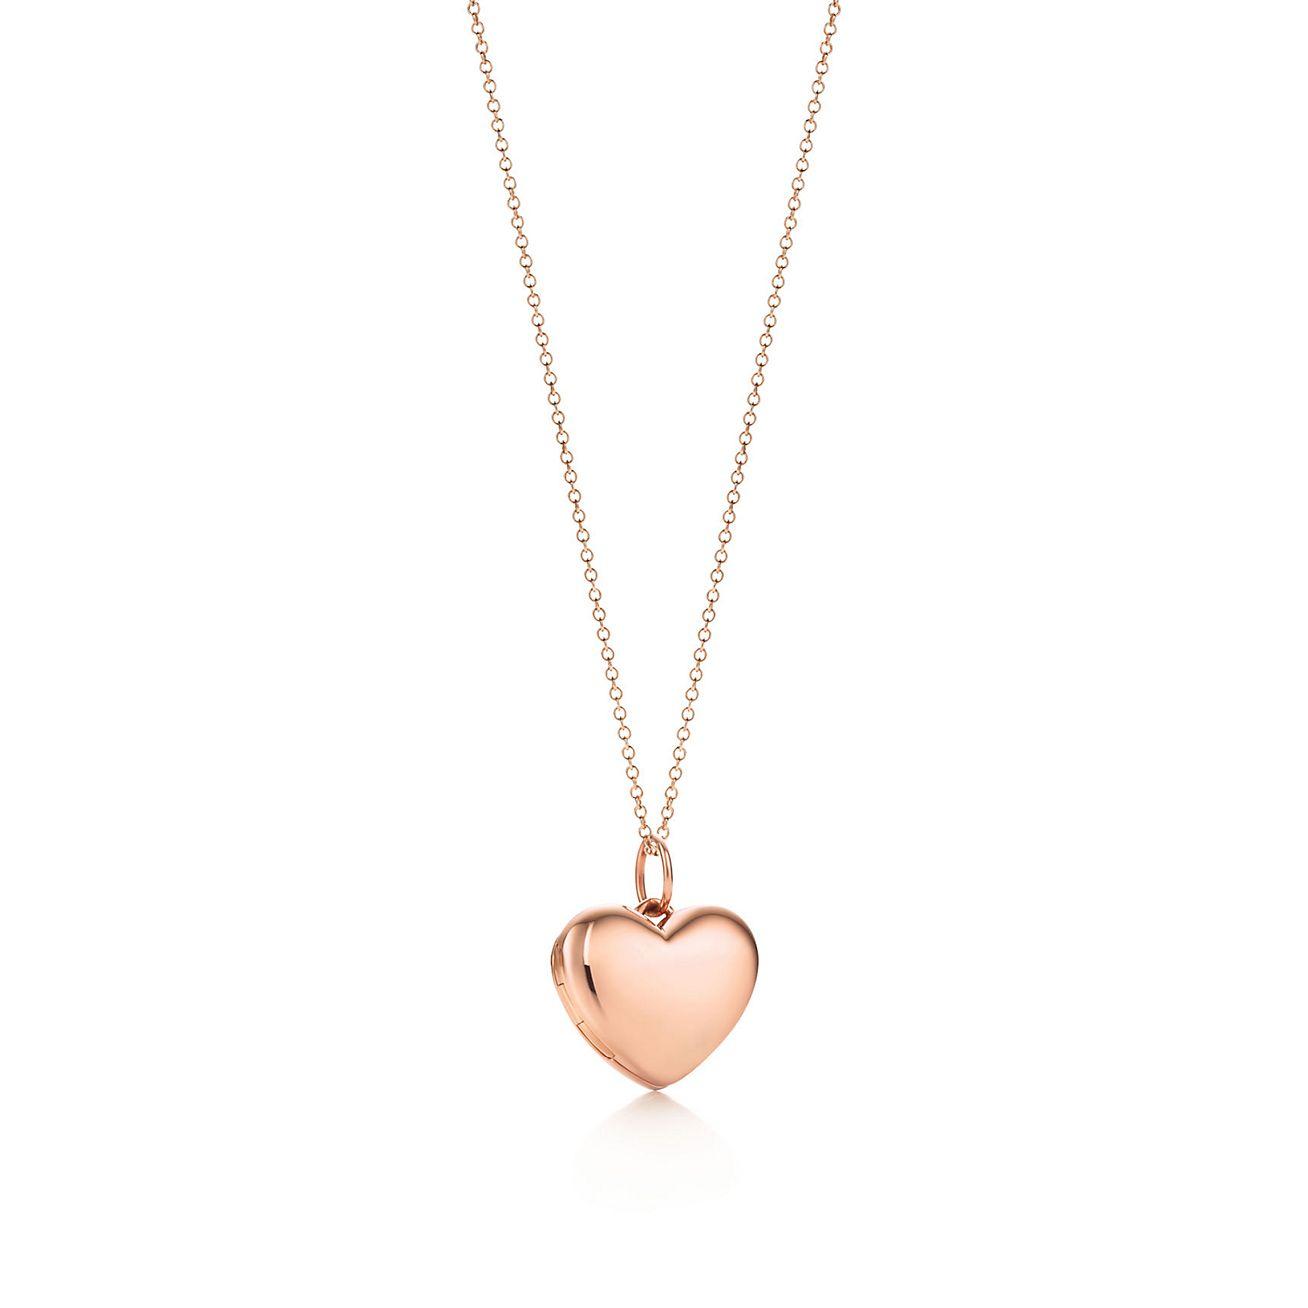 Tiffany locket photo sizer